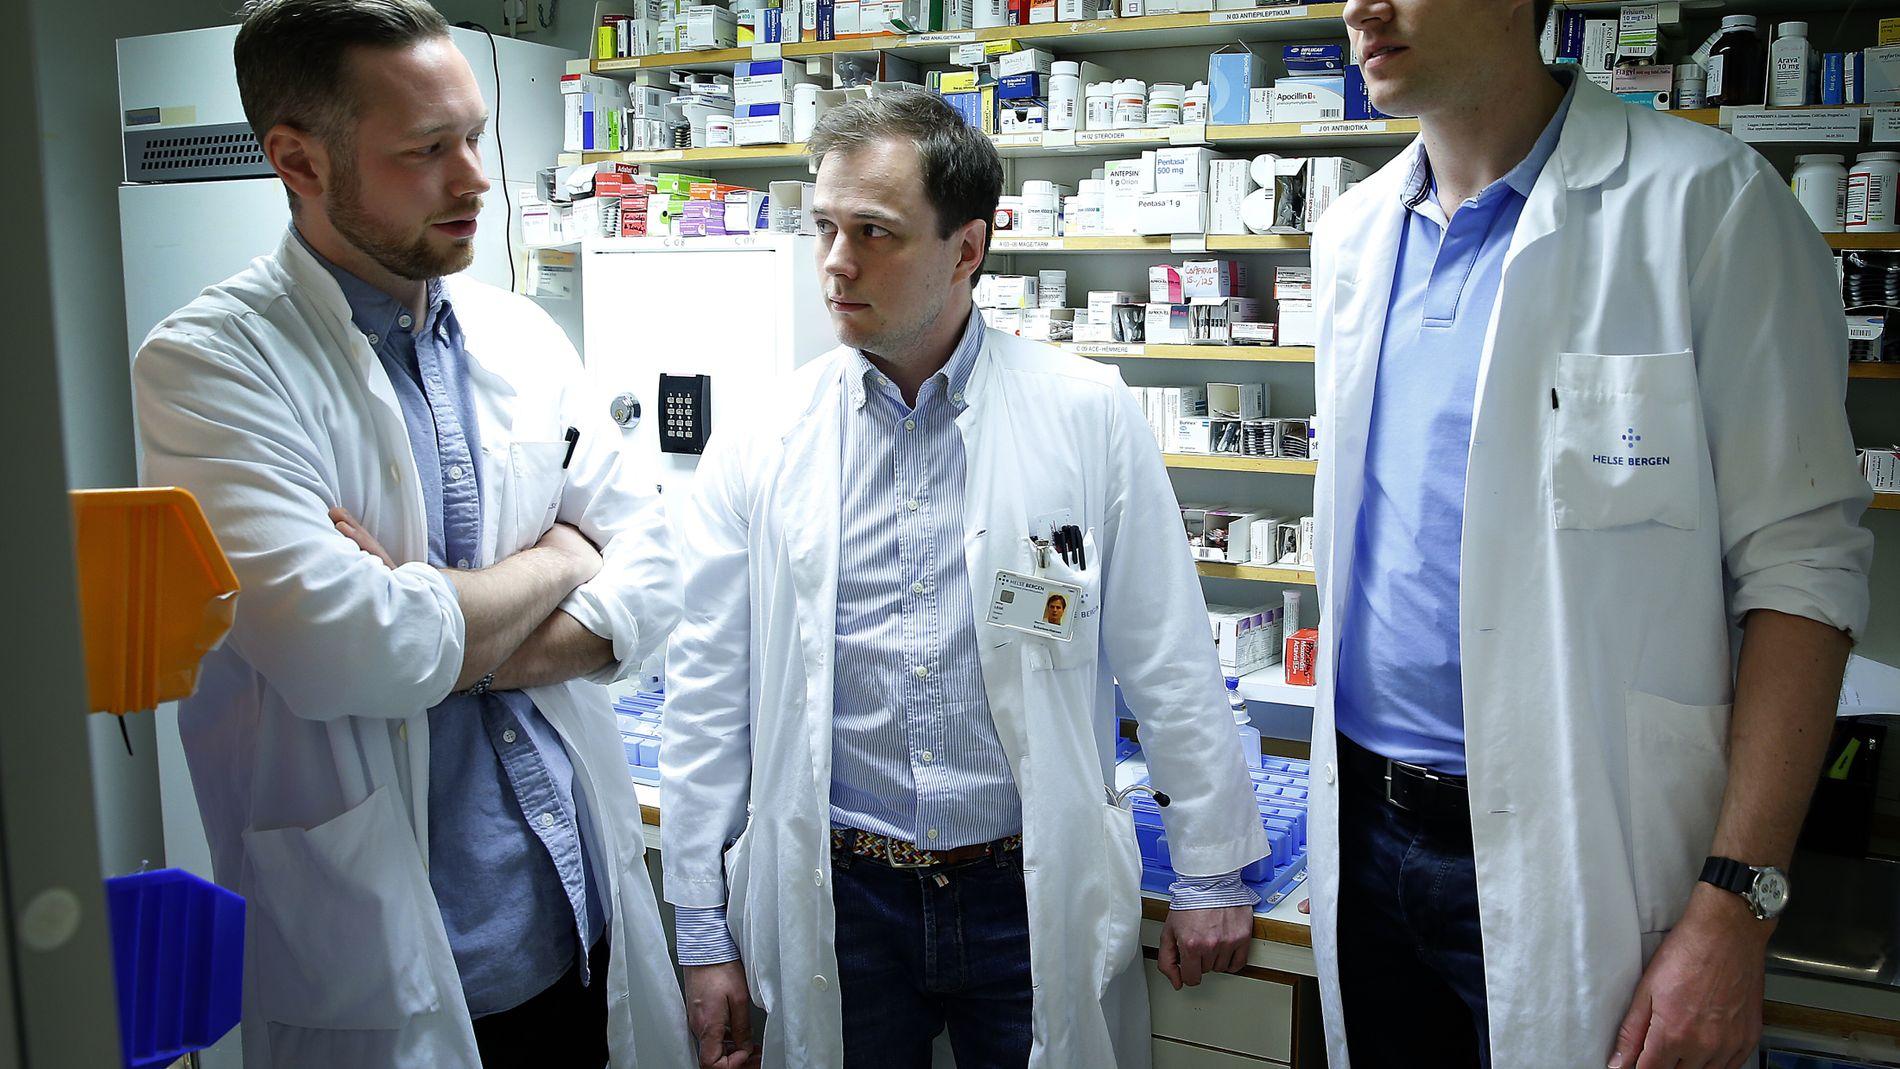 9a55245f Ny forskning: – Vanndrivende medisiner kan være helsefarlige